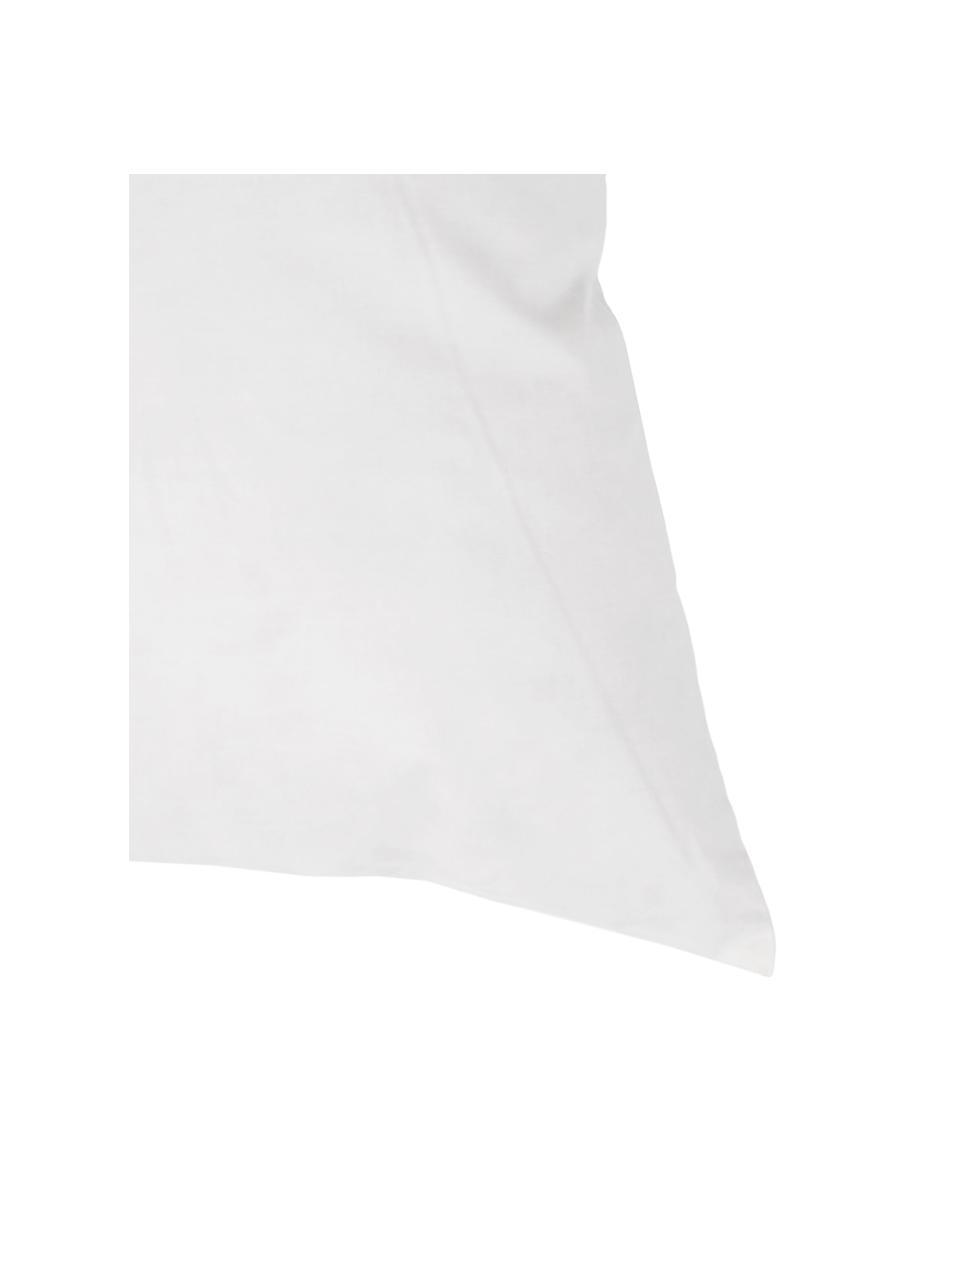 Kissen-Inlett Comfort, 45x45, Feder-Füllung, Bezug: Feinköper, 100% Baumwolle, Weiß, 45 x 45 cm